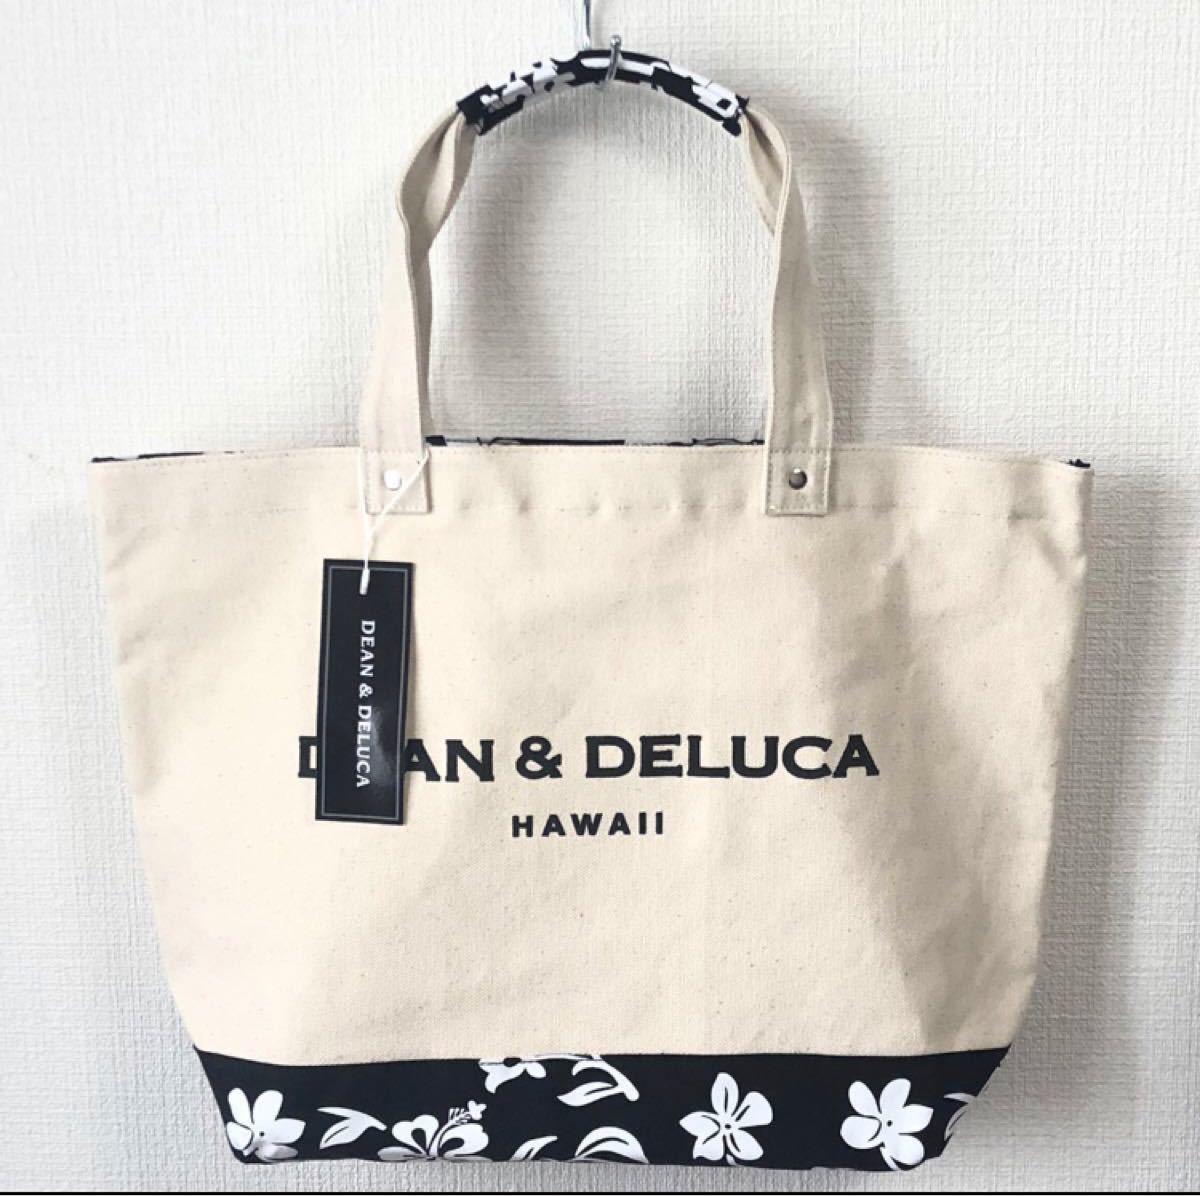 DEAN&DELUCAのトートバック ハンドバック!ハワイ限定品 エコバッグ  ディーン&デルーカ ディーンアンドデルーカ